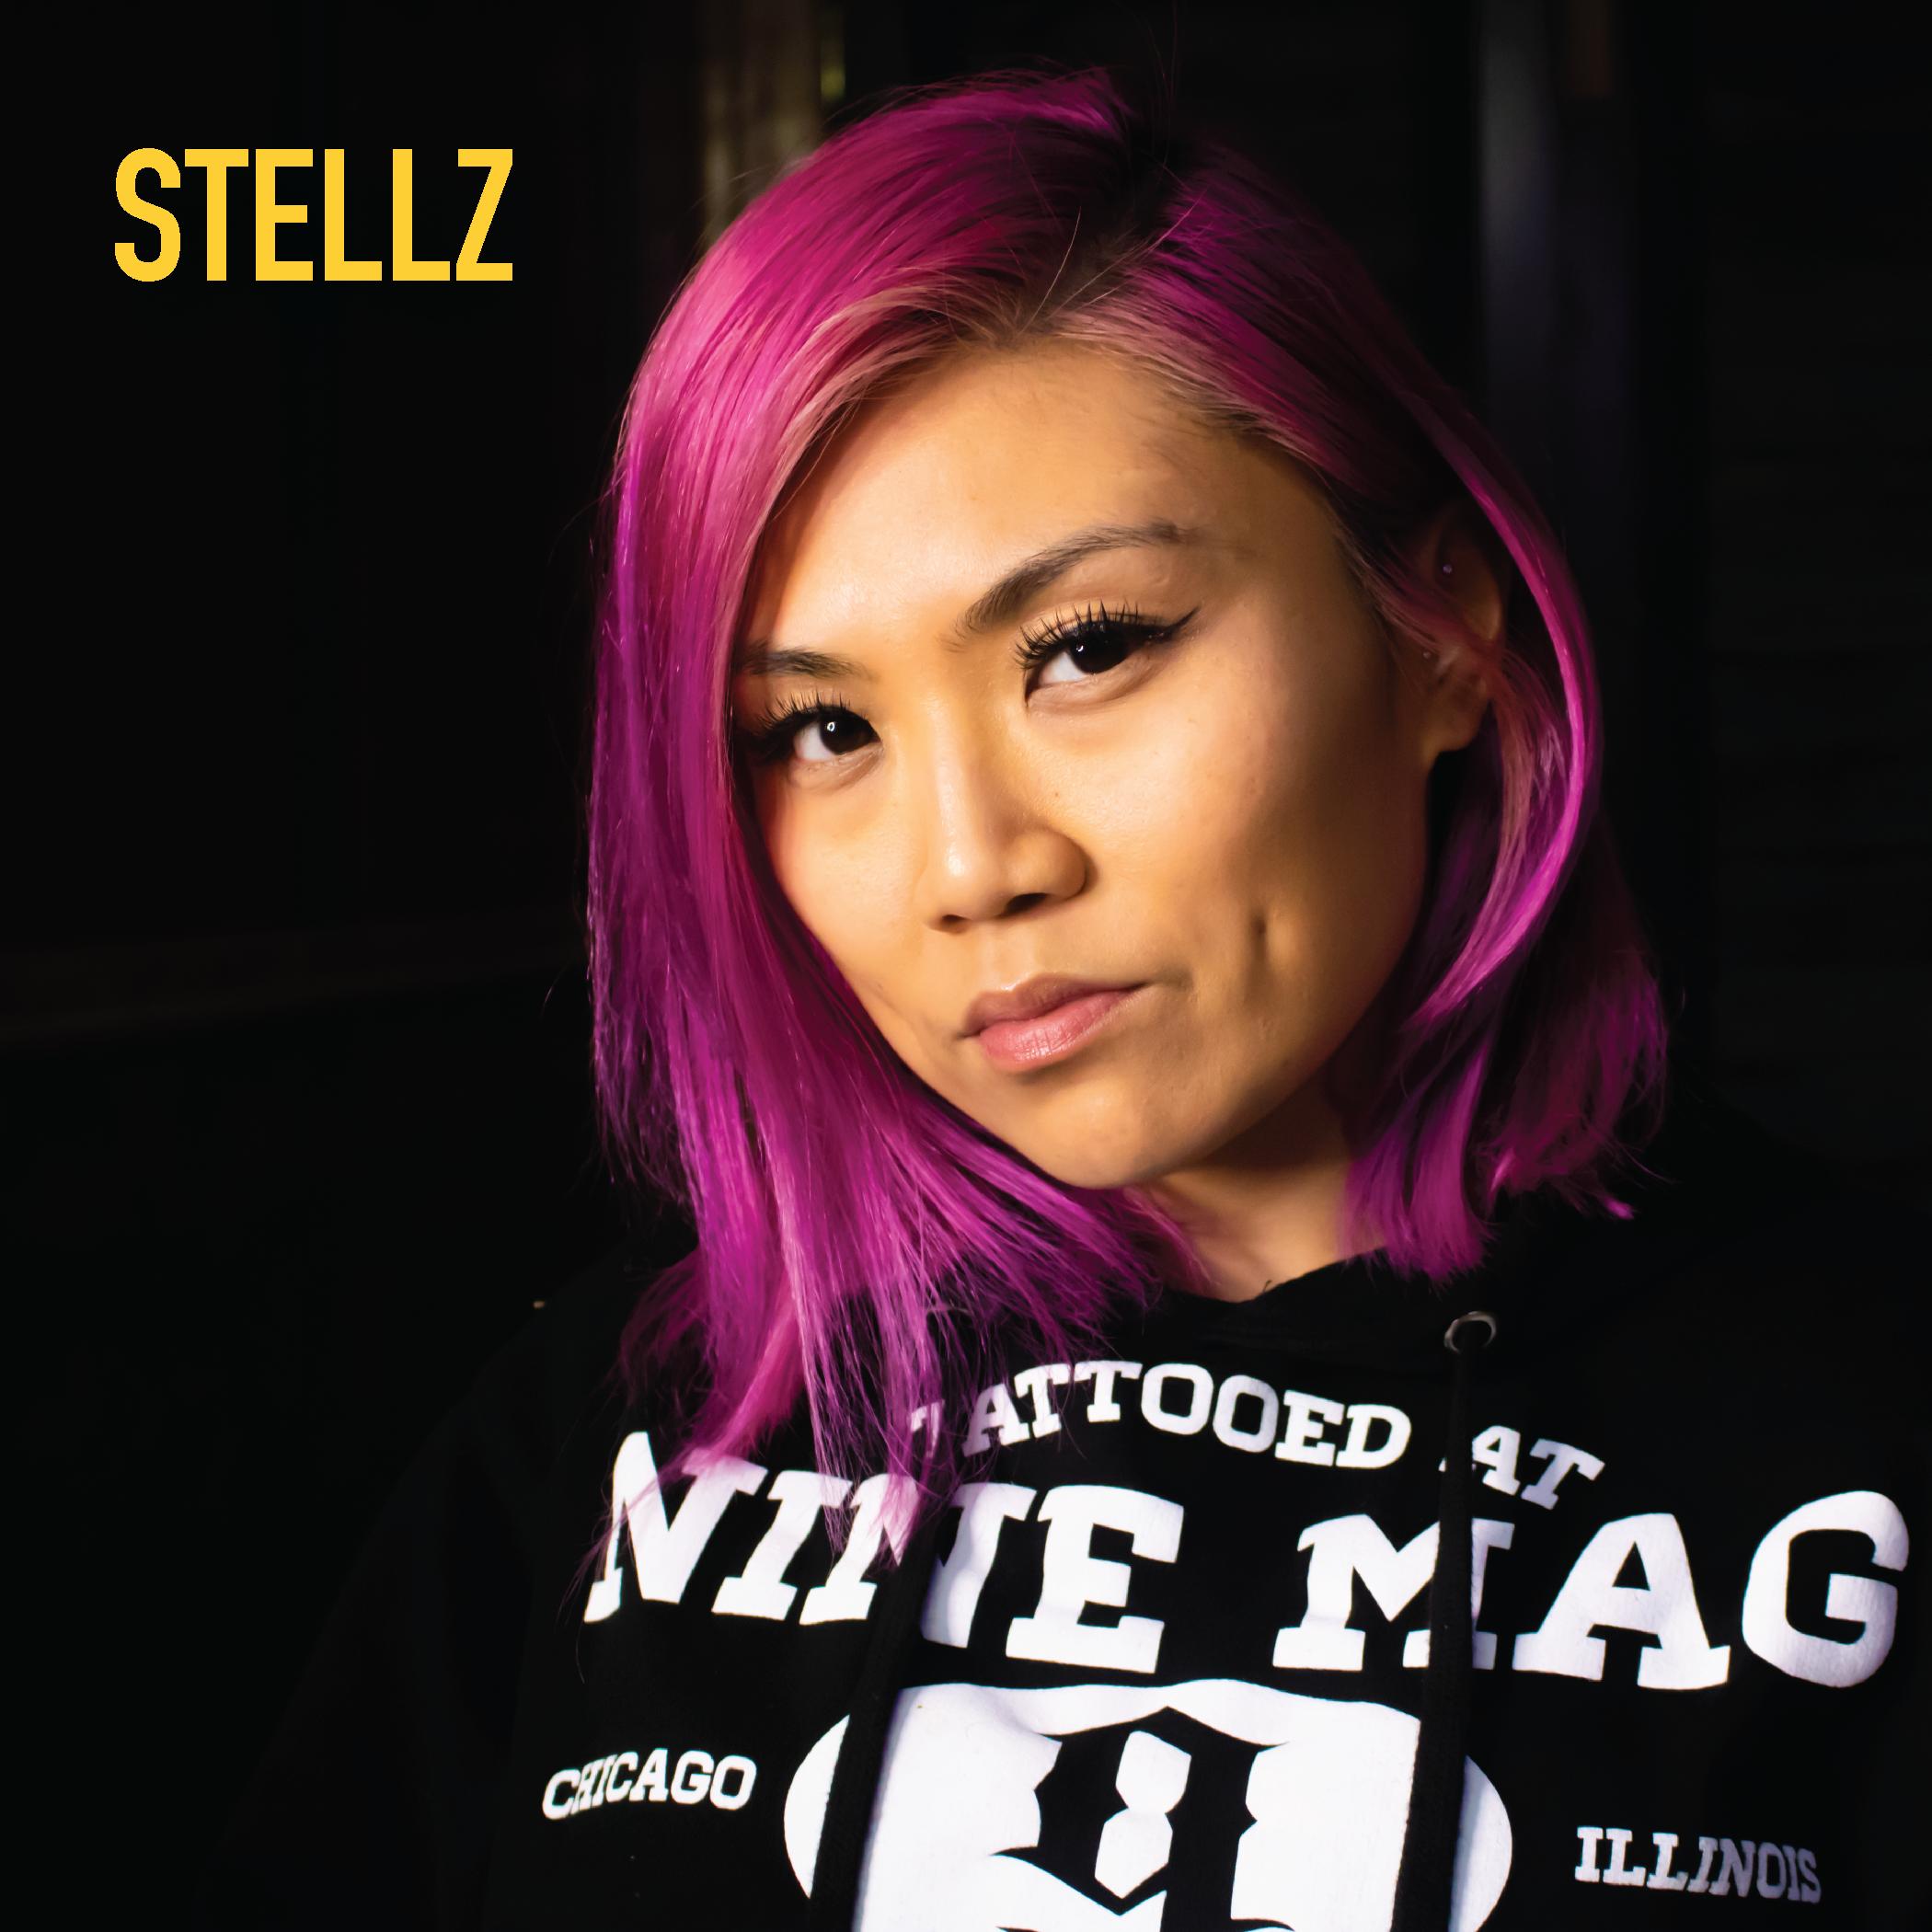 stellz_profile-03.png